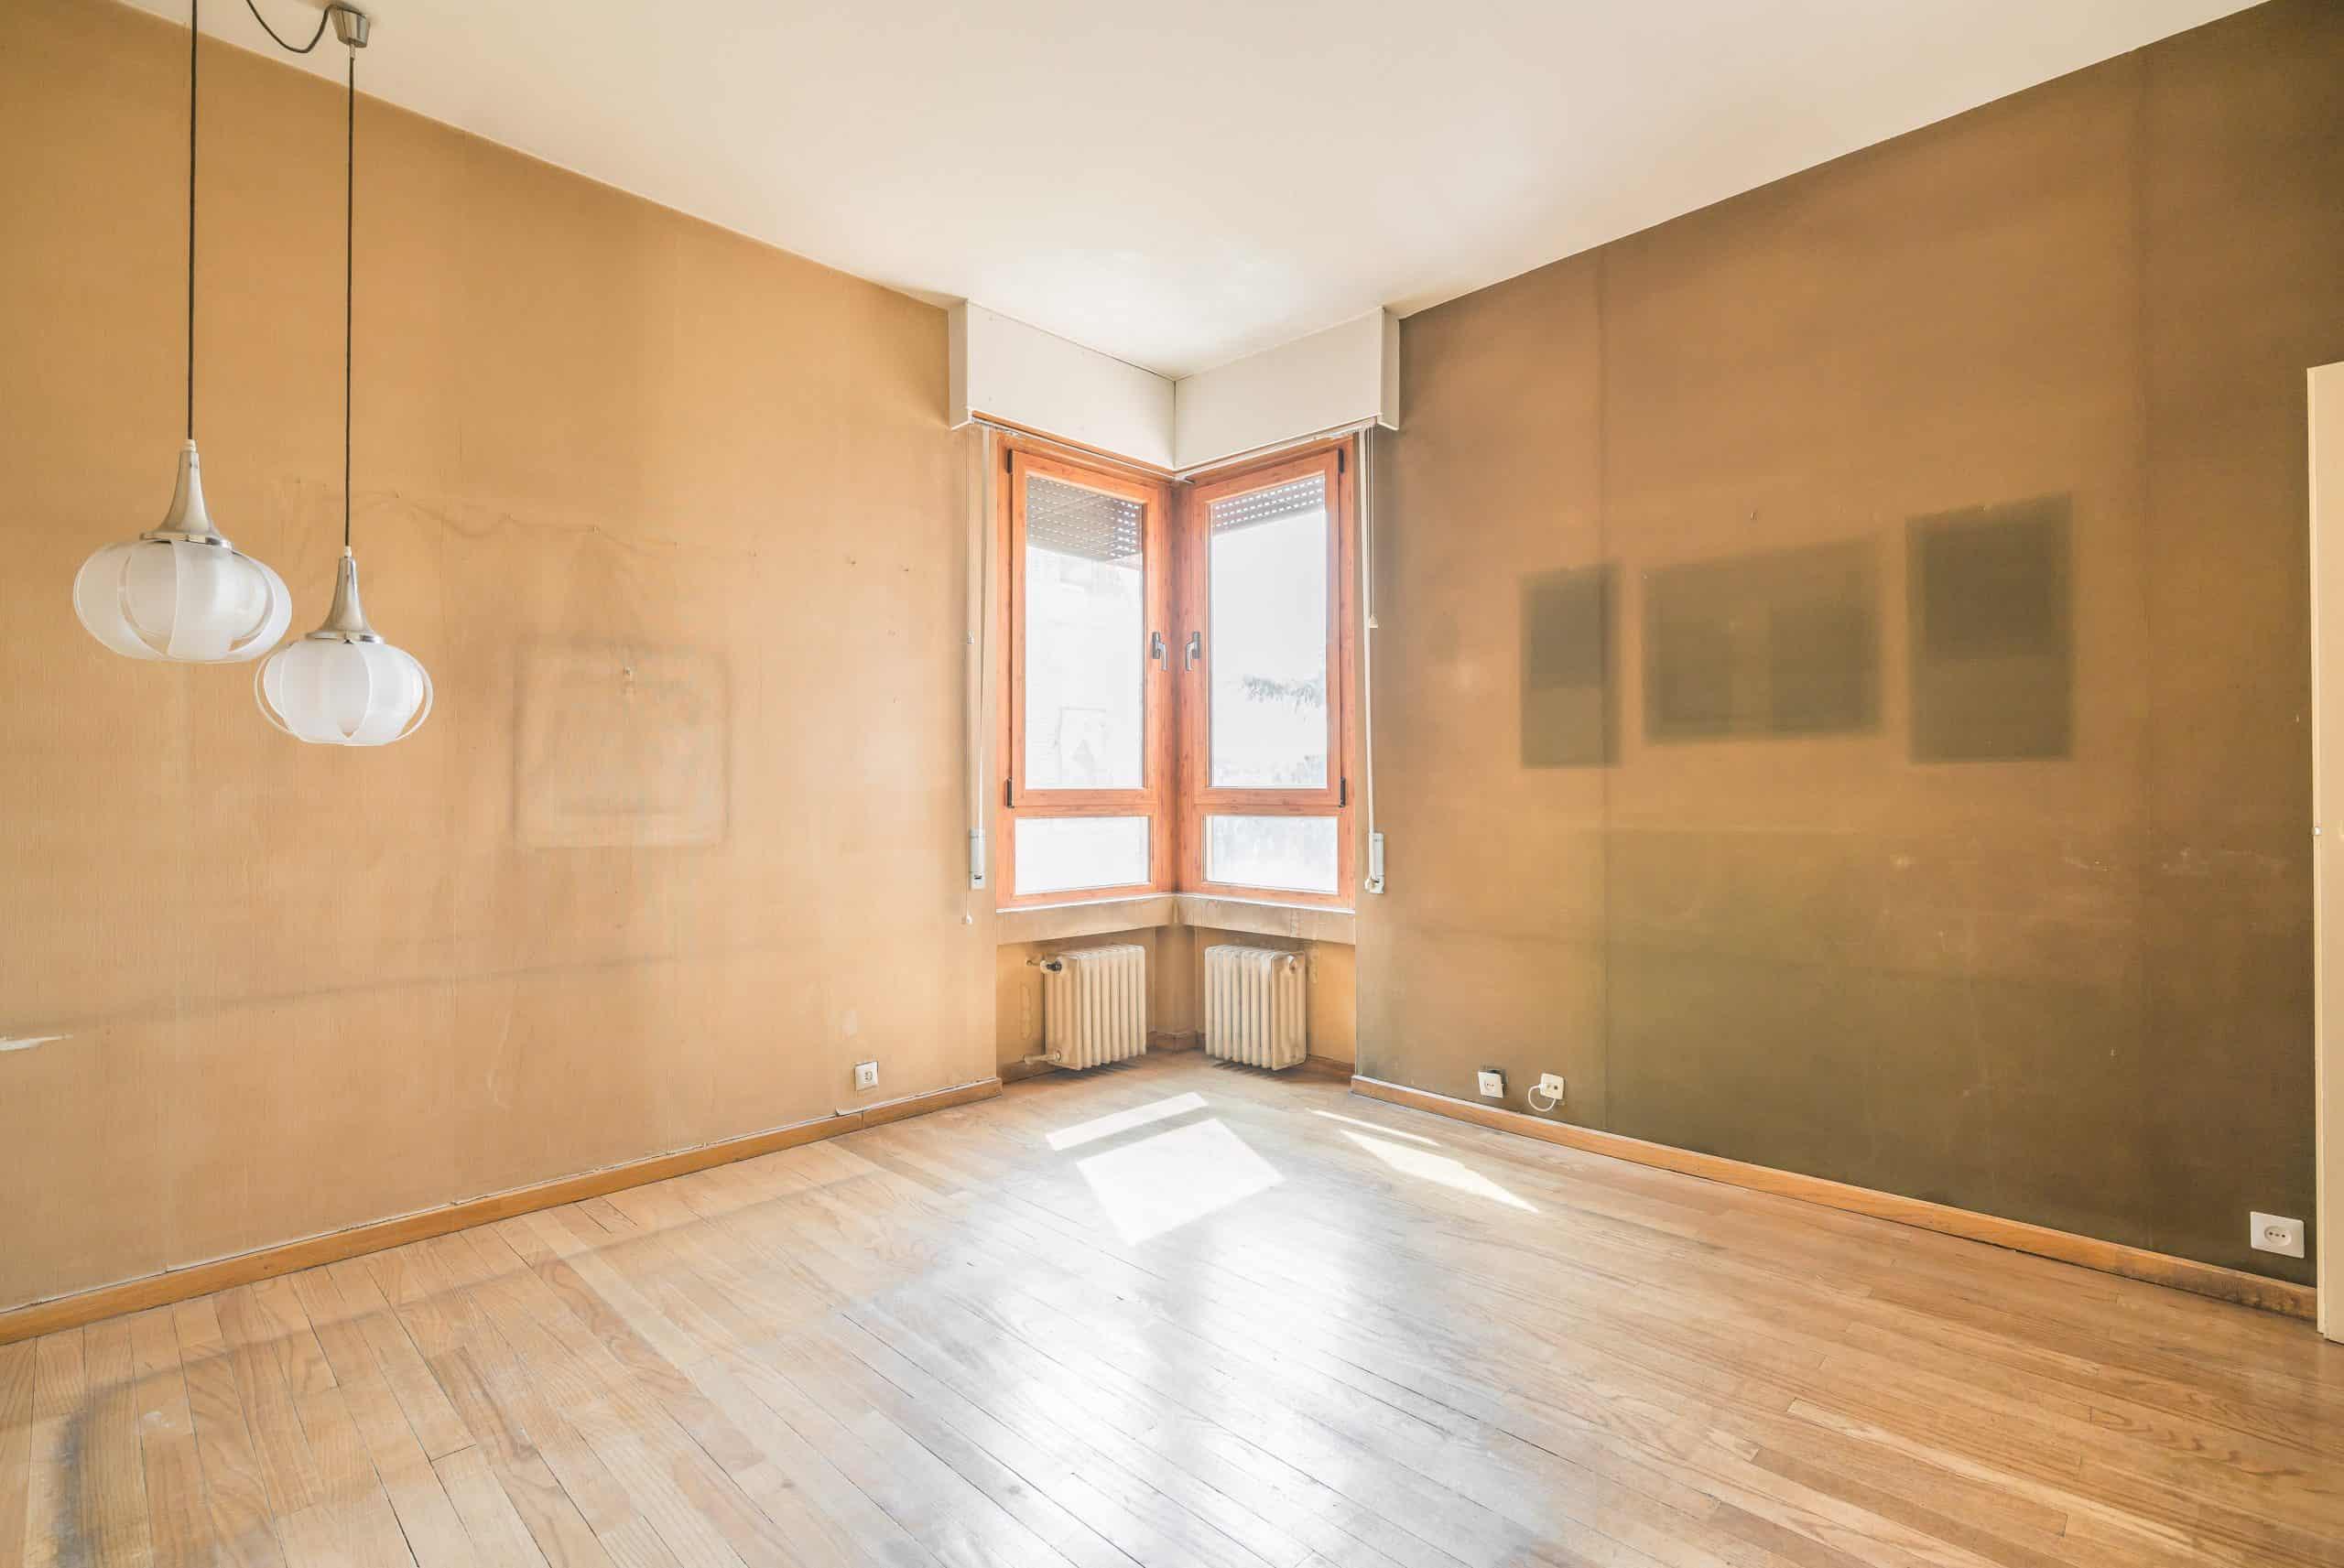 Agencia Inmobiliaria de Madrid-FUTUROCASA-Zona ARGANZUELA-EMBAJADORES-LEGAZPI -calle Embajadores- baño 16